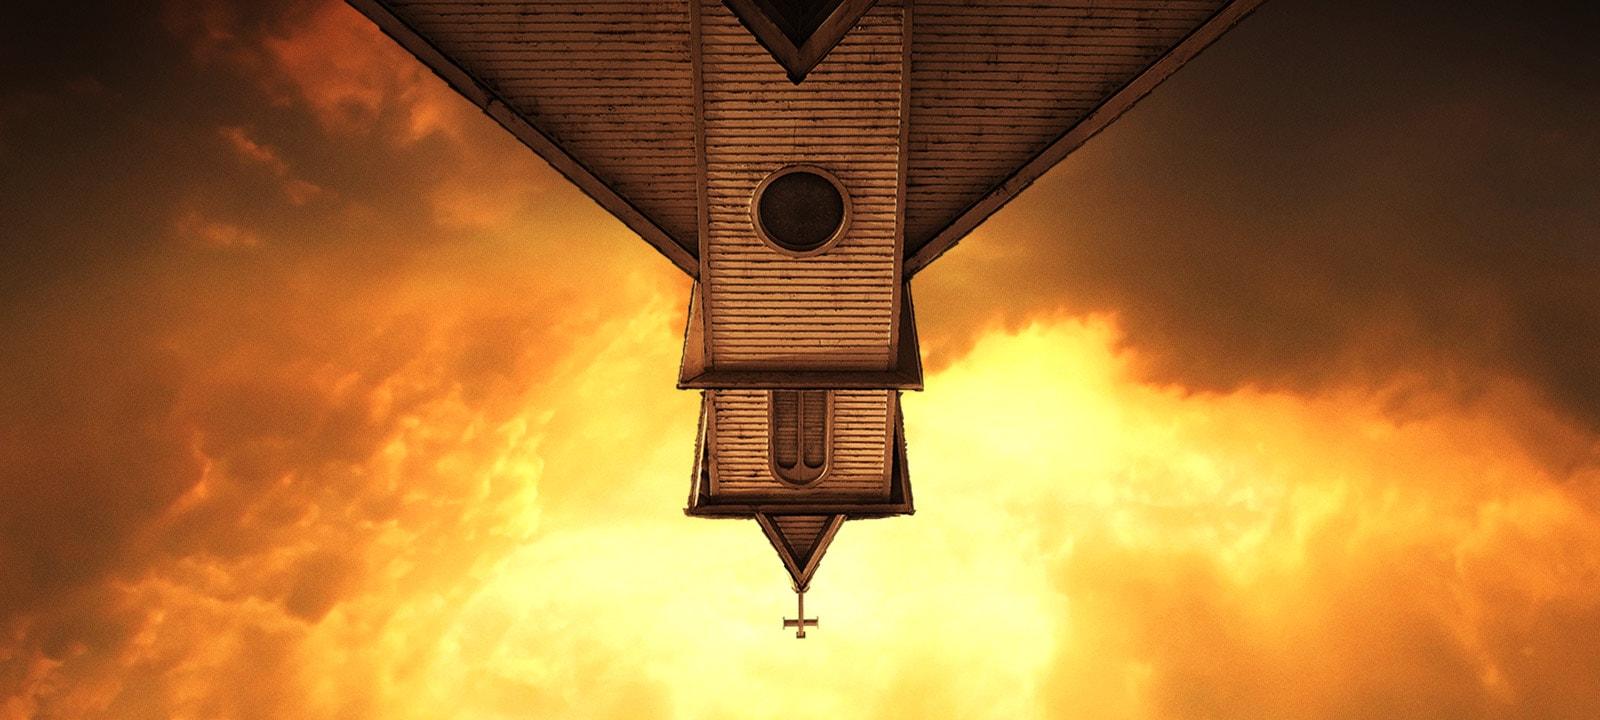 preacher-key-800×600